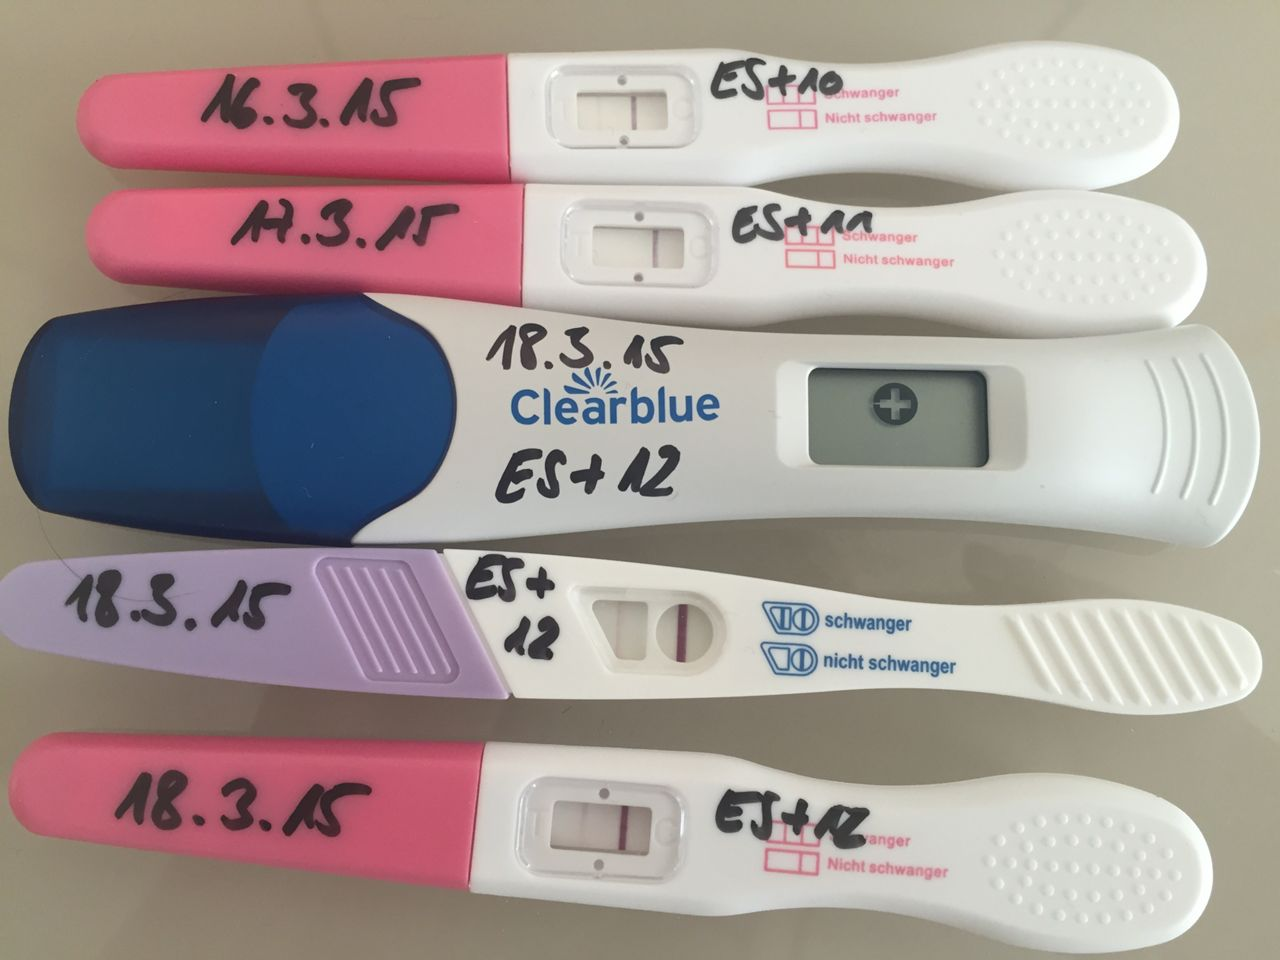 Ss test negativ trotzdem schwanger   SStest negativ